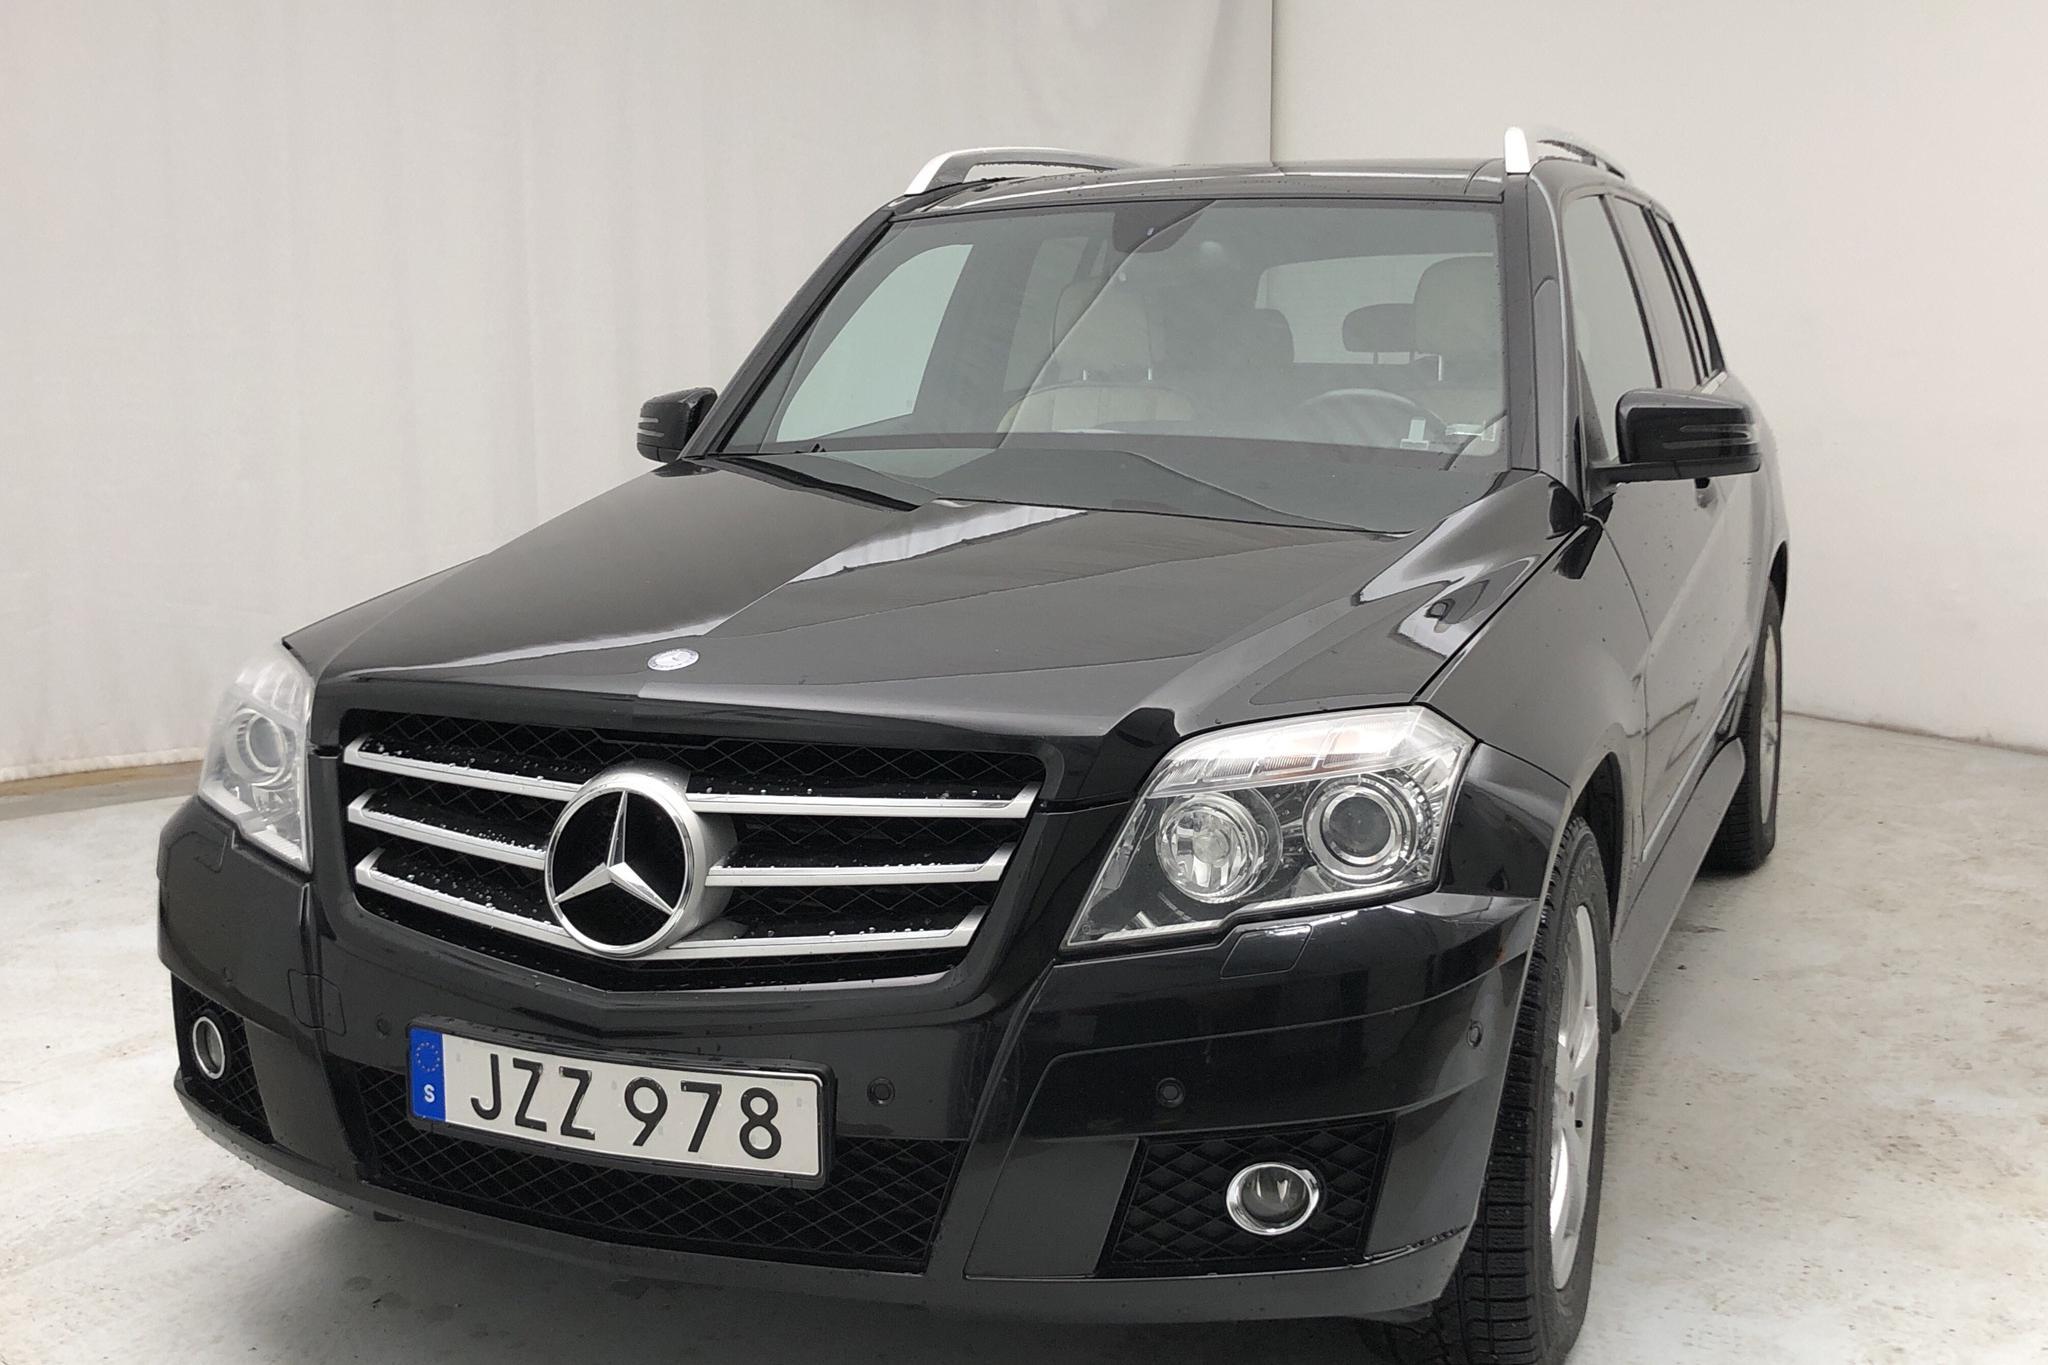 Mercedes GLK 320 CDI (224hk) - 20 340 mil - Automat - svart - 2009